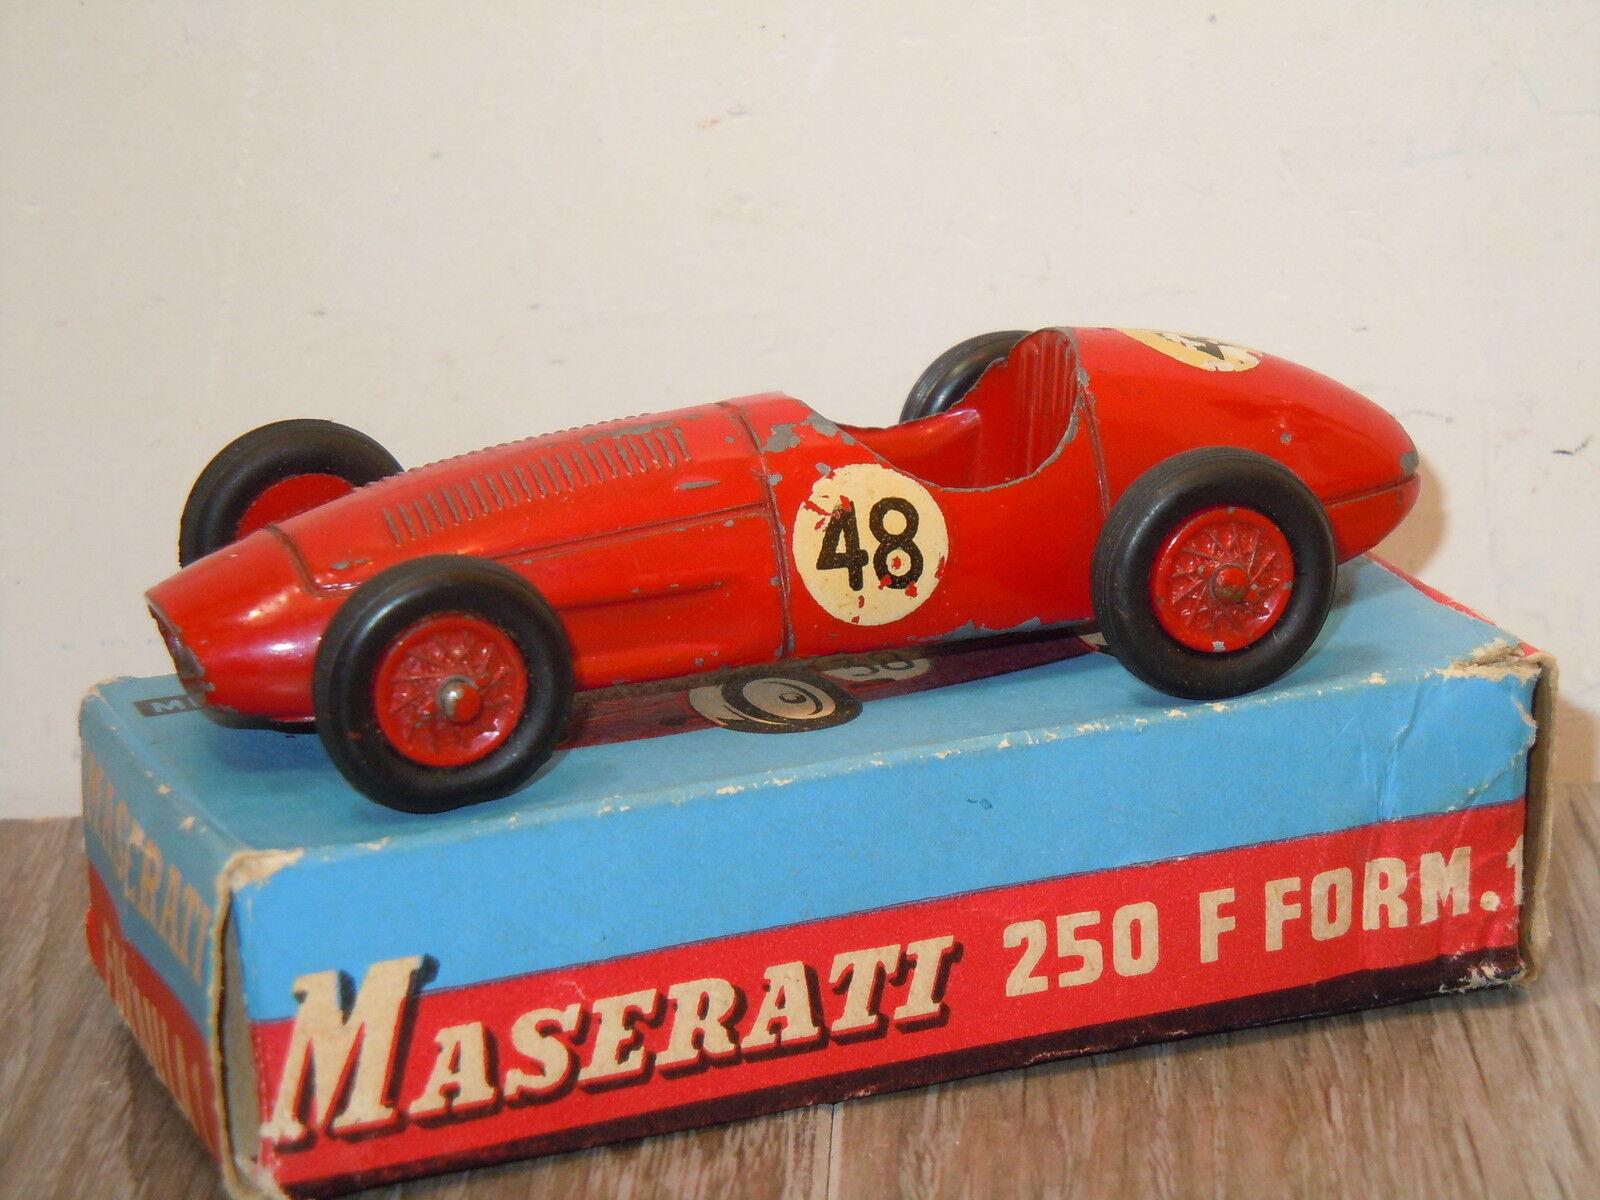 Maserati 250F Formule 1 van Mercury 52  in Box 18591